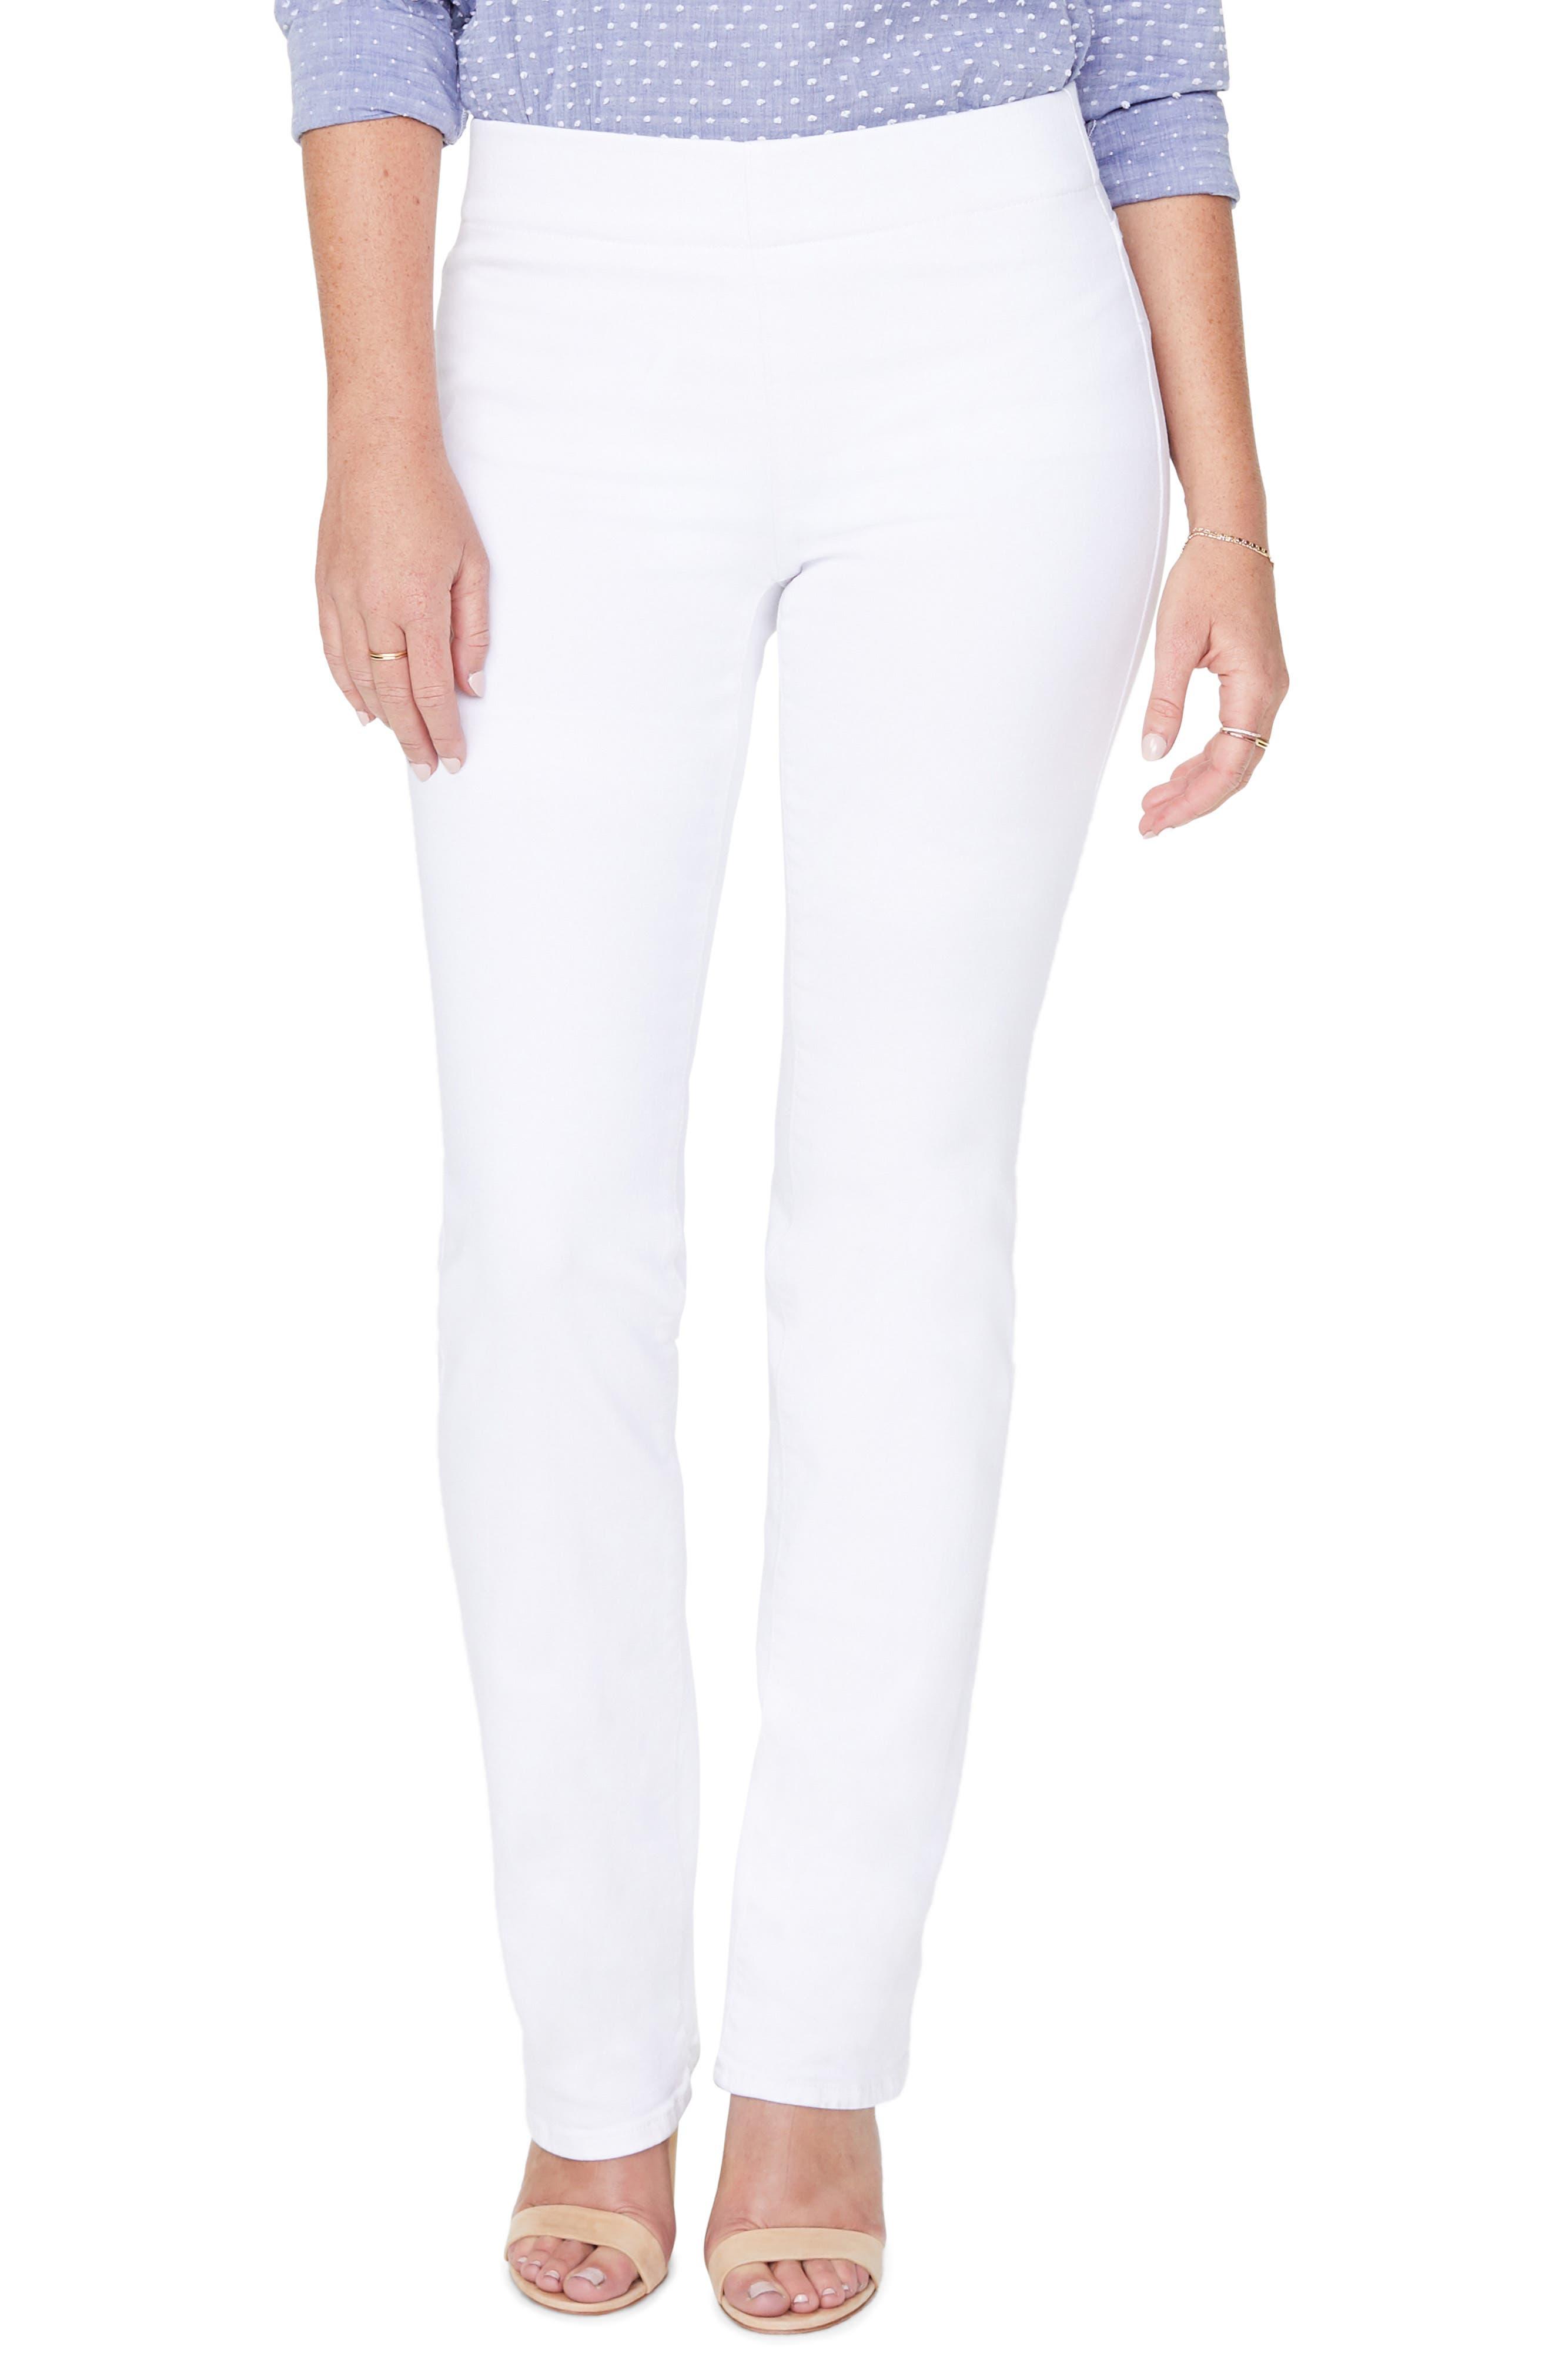 Petite Women's NYDJ Pull-On Straight Leg Jeans